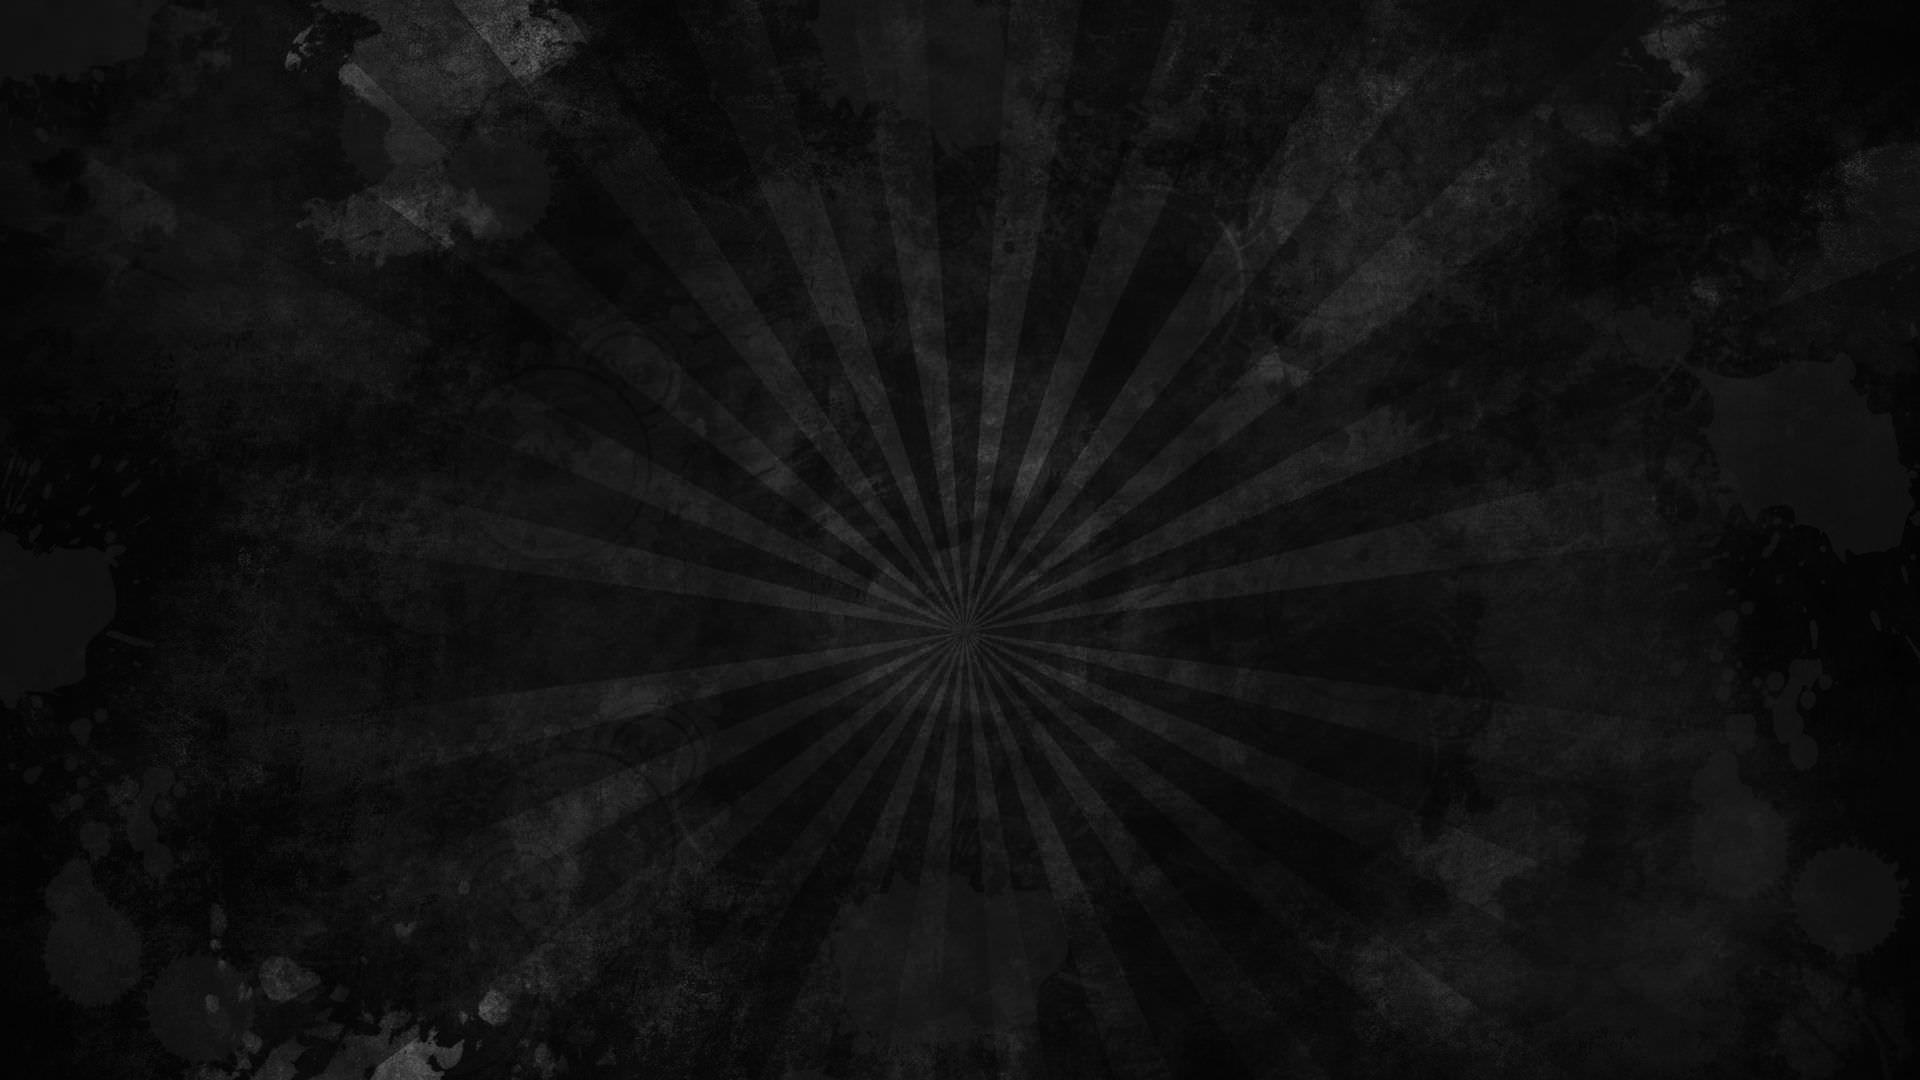 Res: 1920x1080, Black Grunge Sunburst Wallpaper